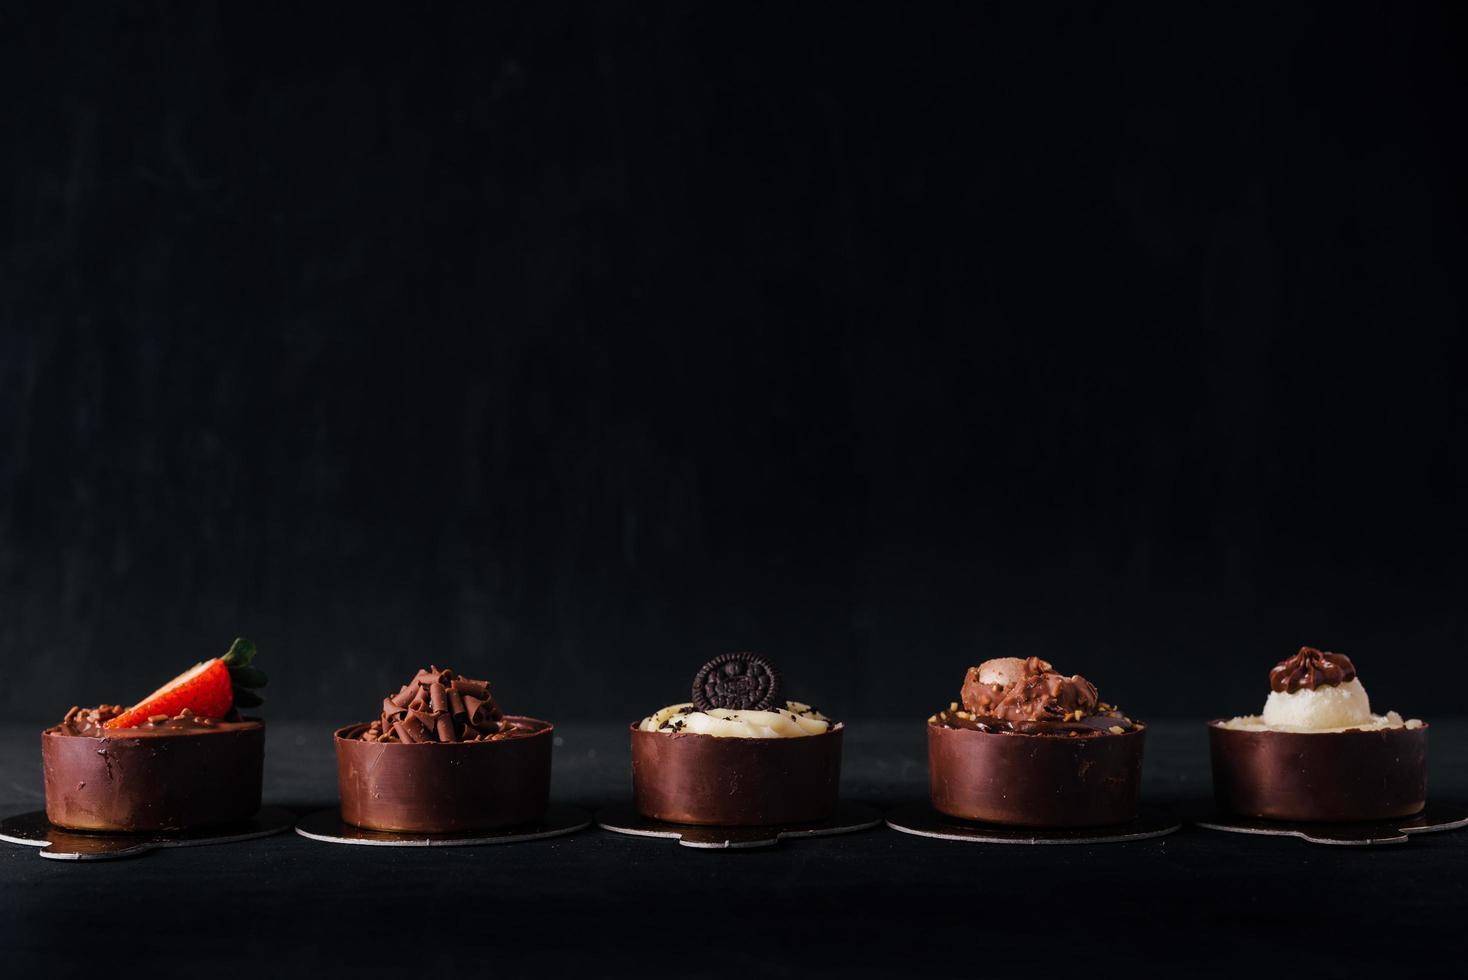 chocoladedesserts op een donkere achtergrond foto